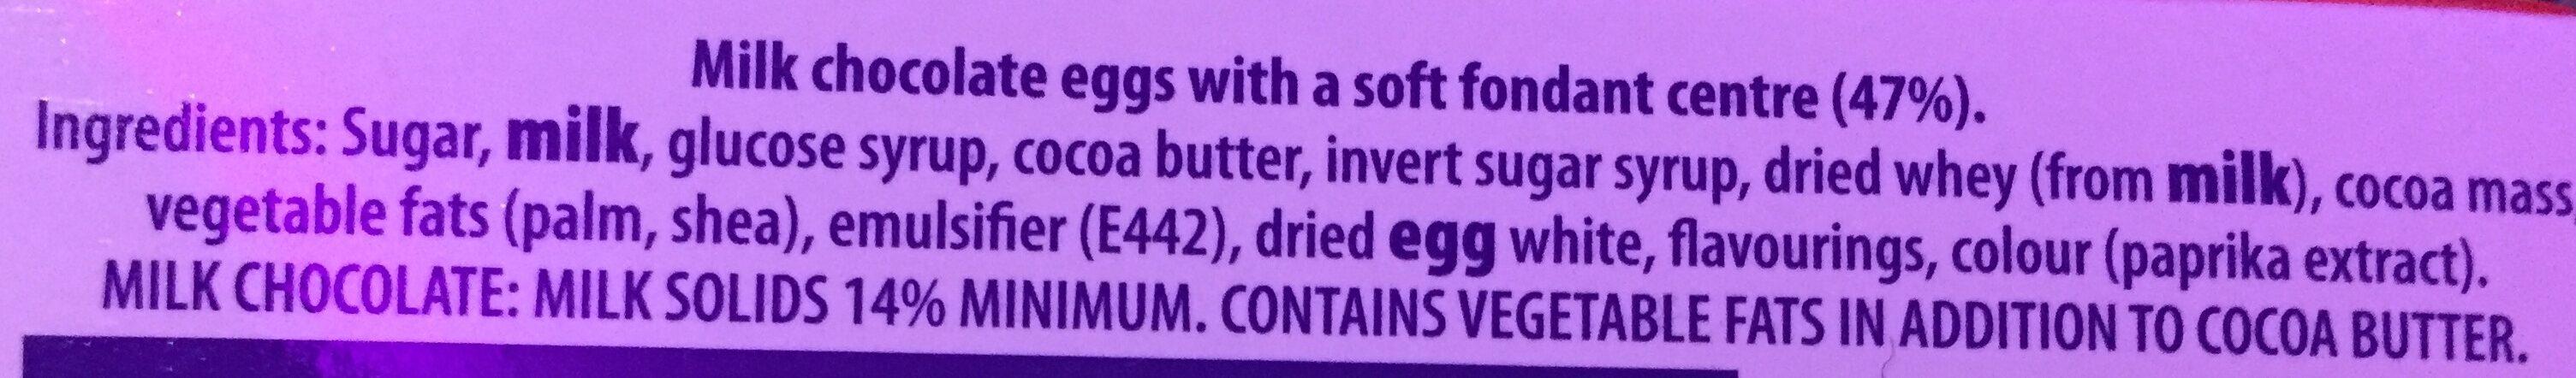 Creme Egg 5 Pack - Ingredients - en